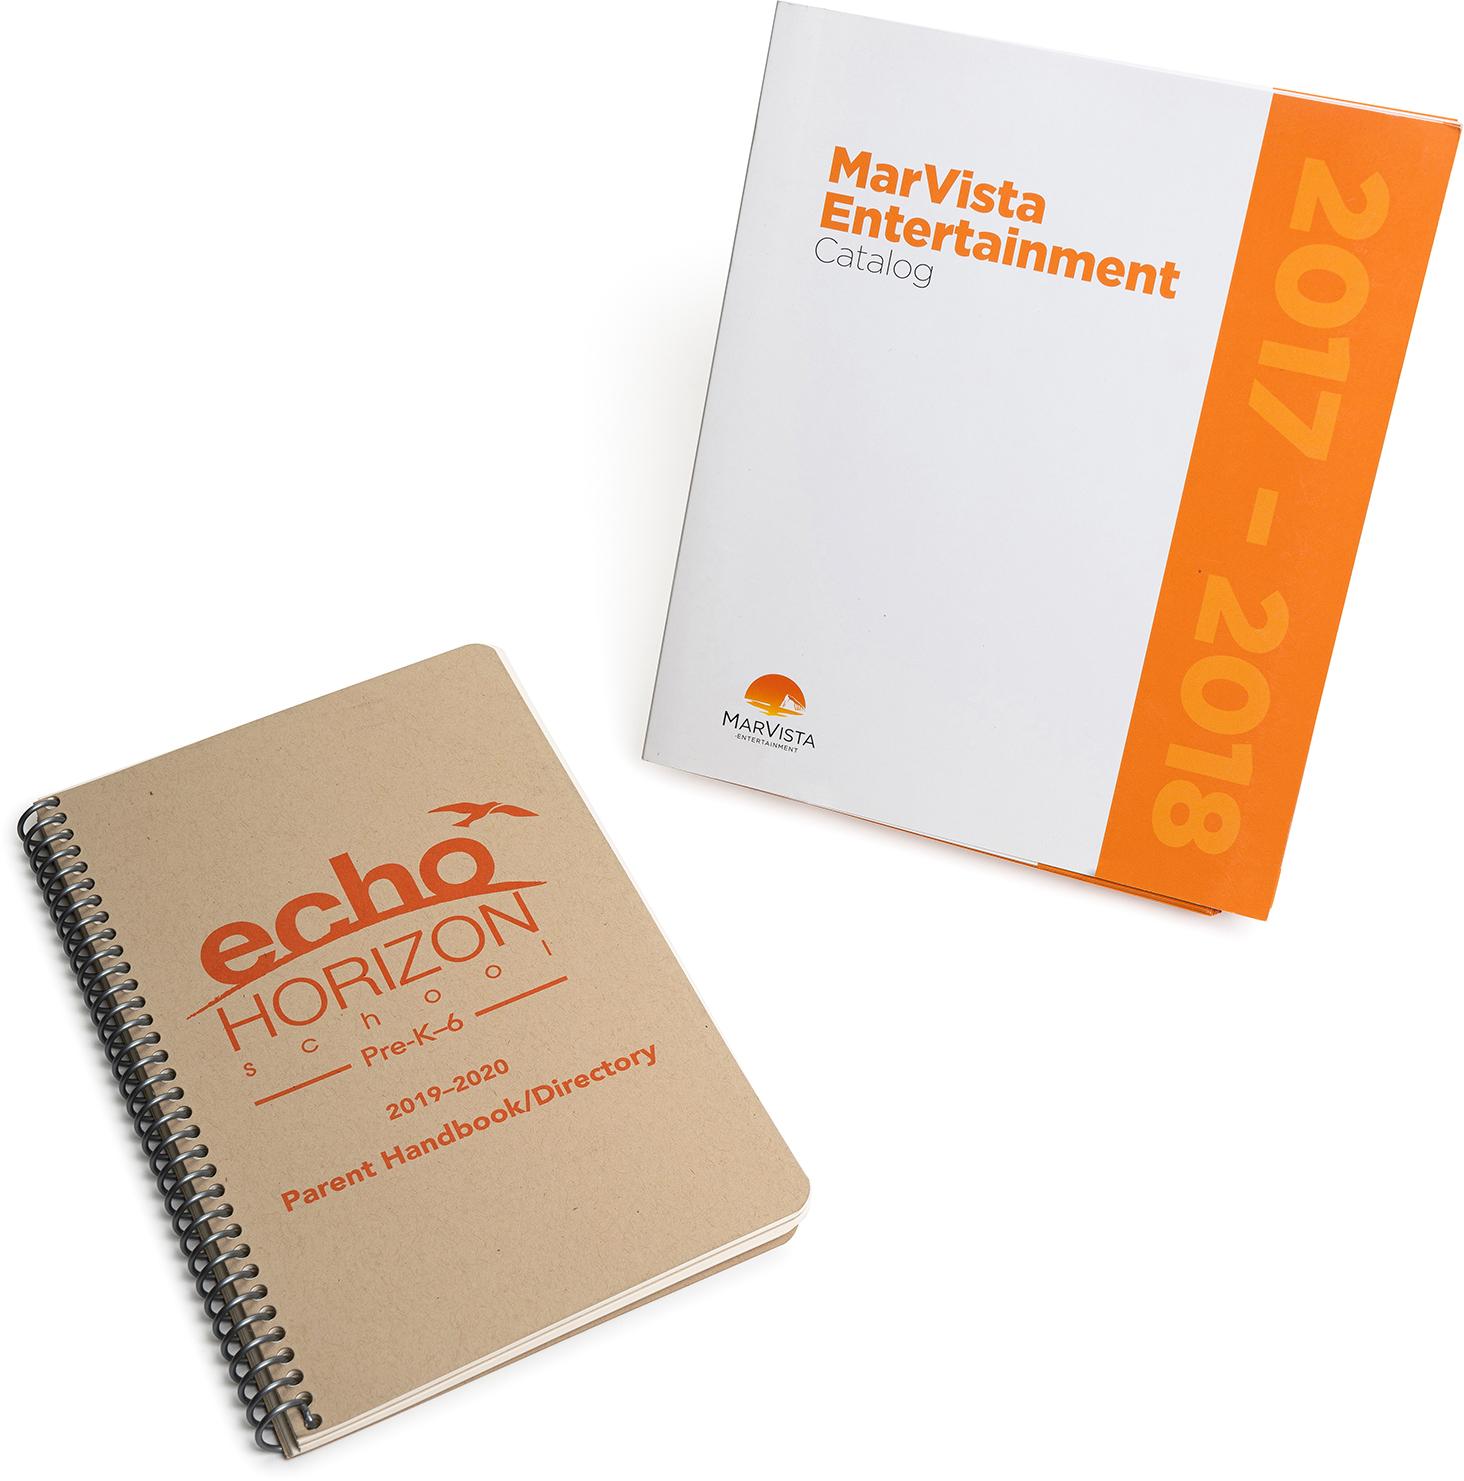 Educational institutions spiral bind, saddle stitch, handbook, catalog, digital